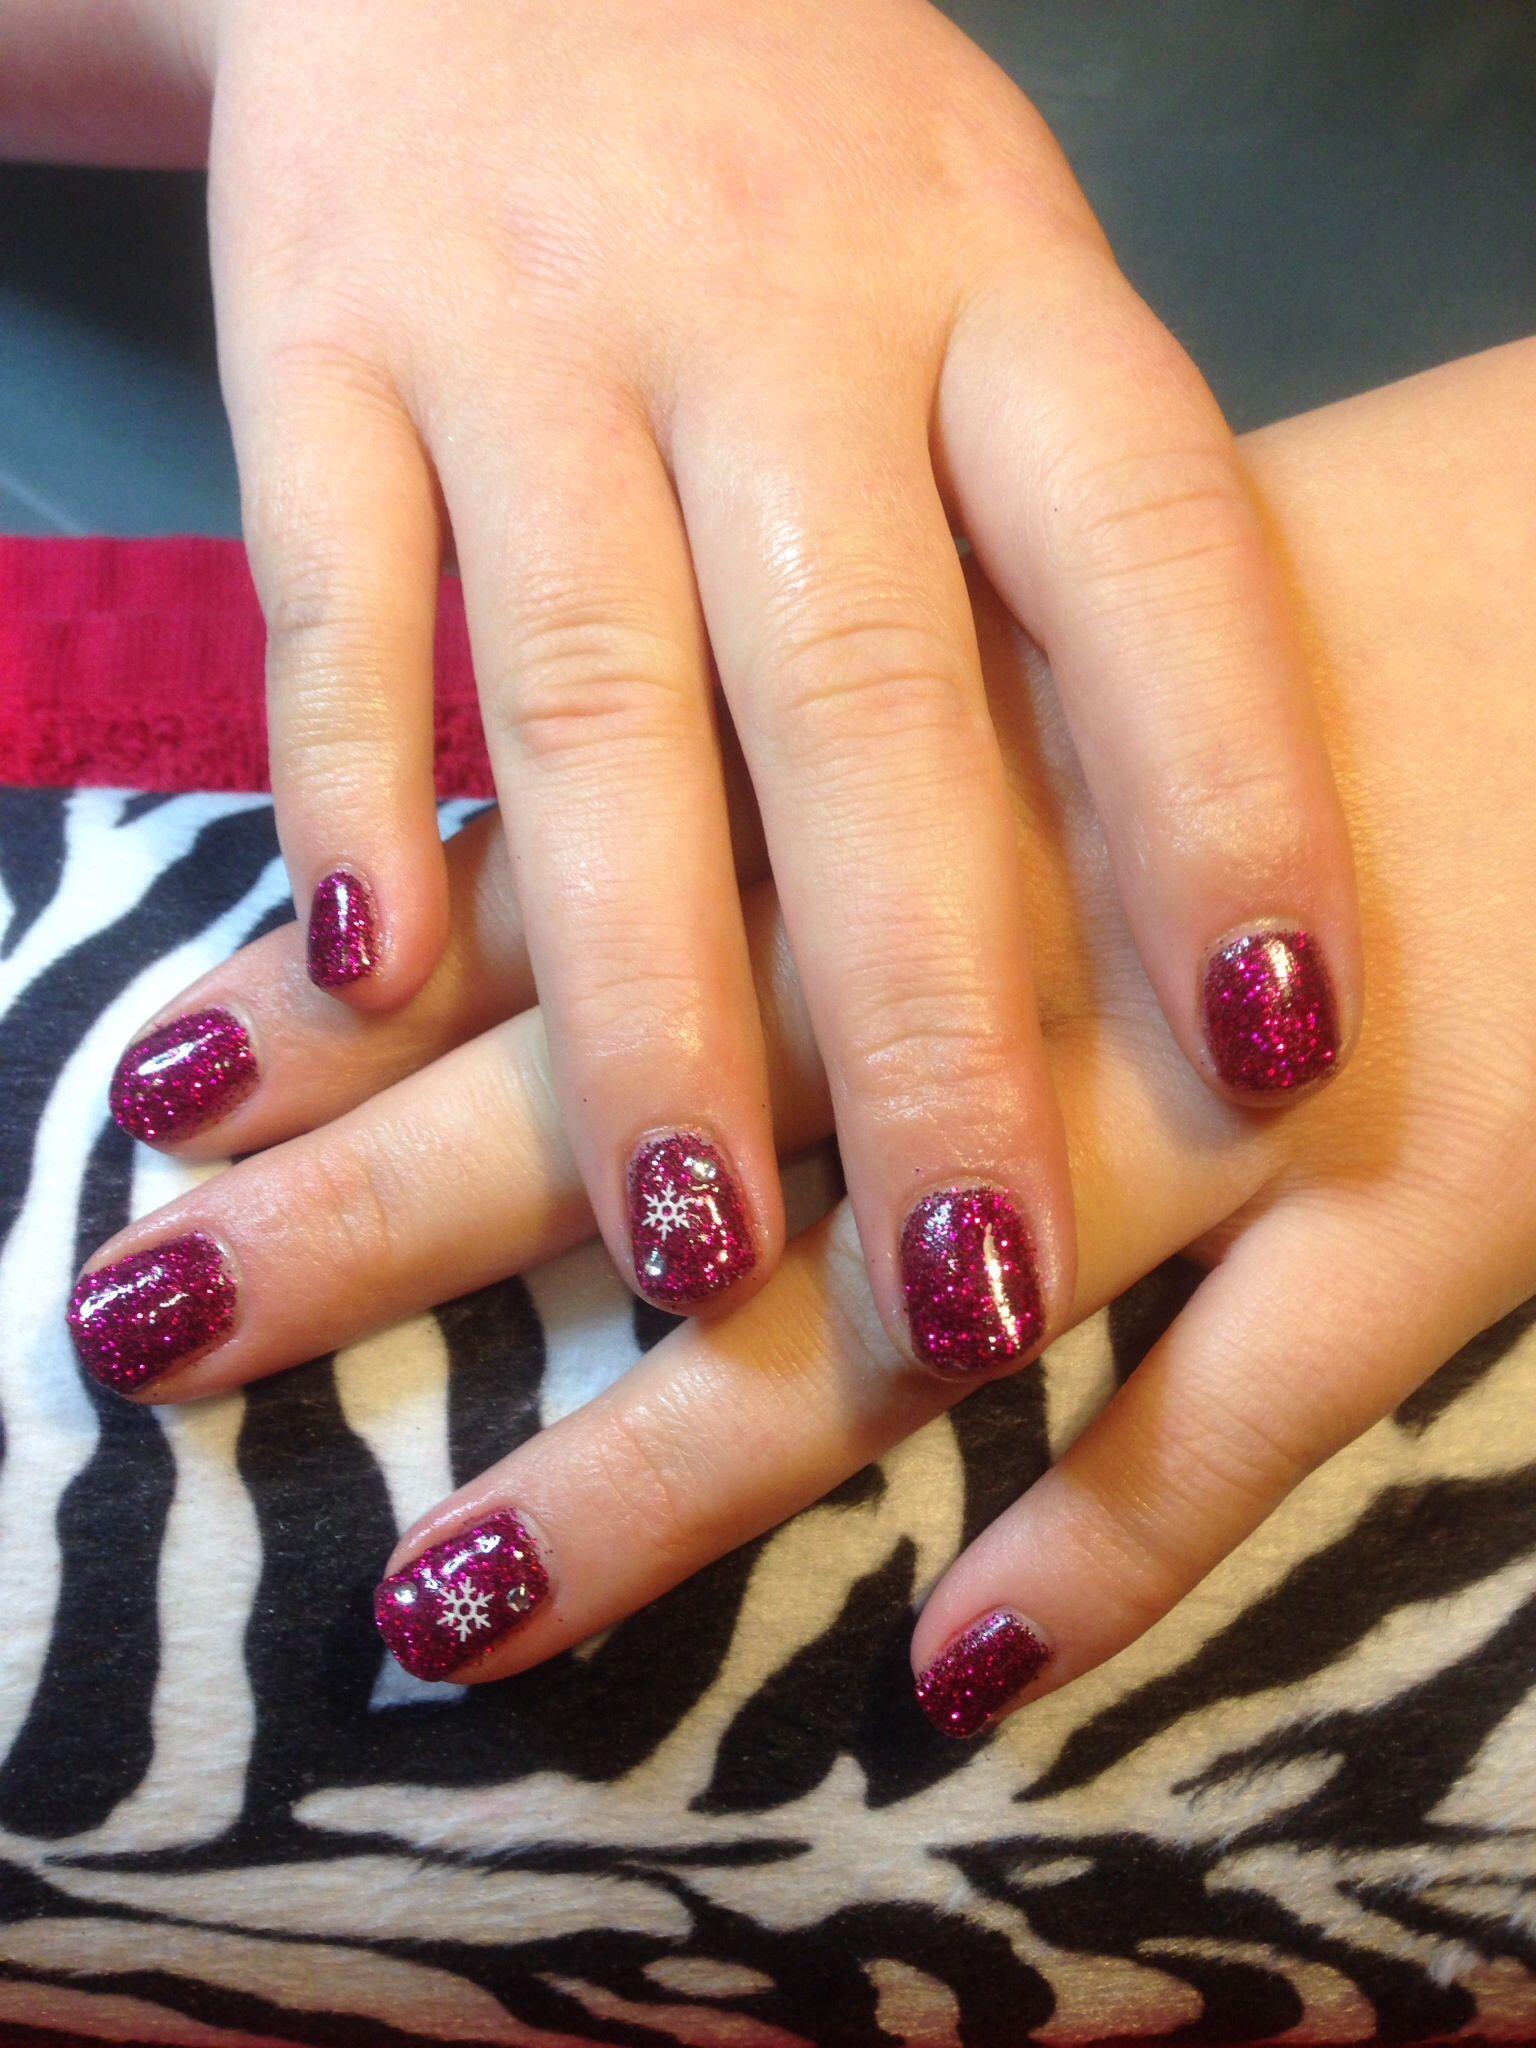 Nexgen nails with Christmas snowflake :-) | nail.styles | Pinterest